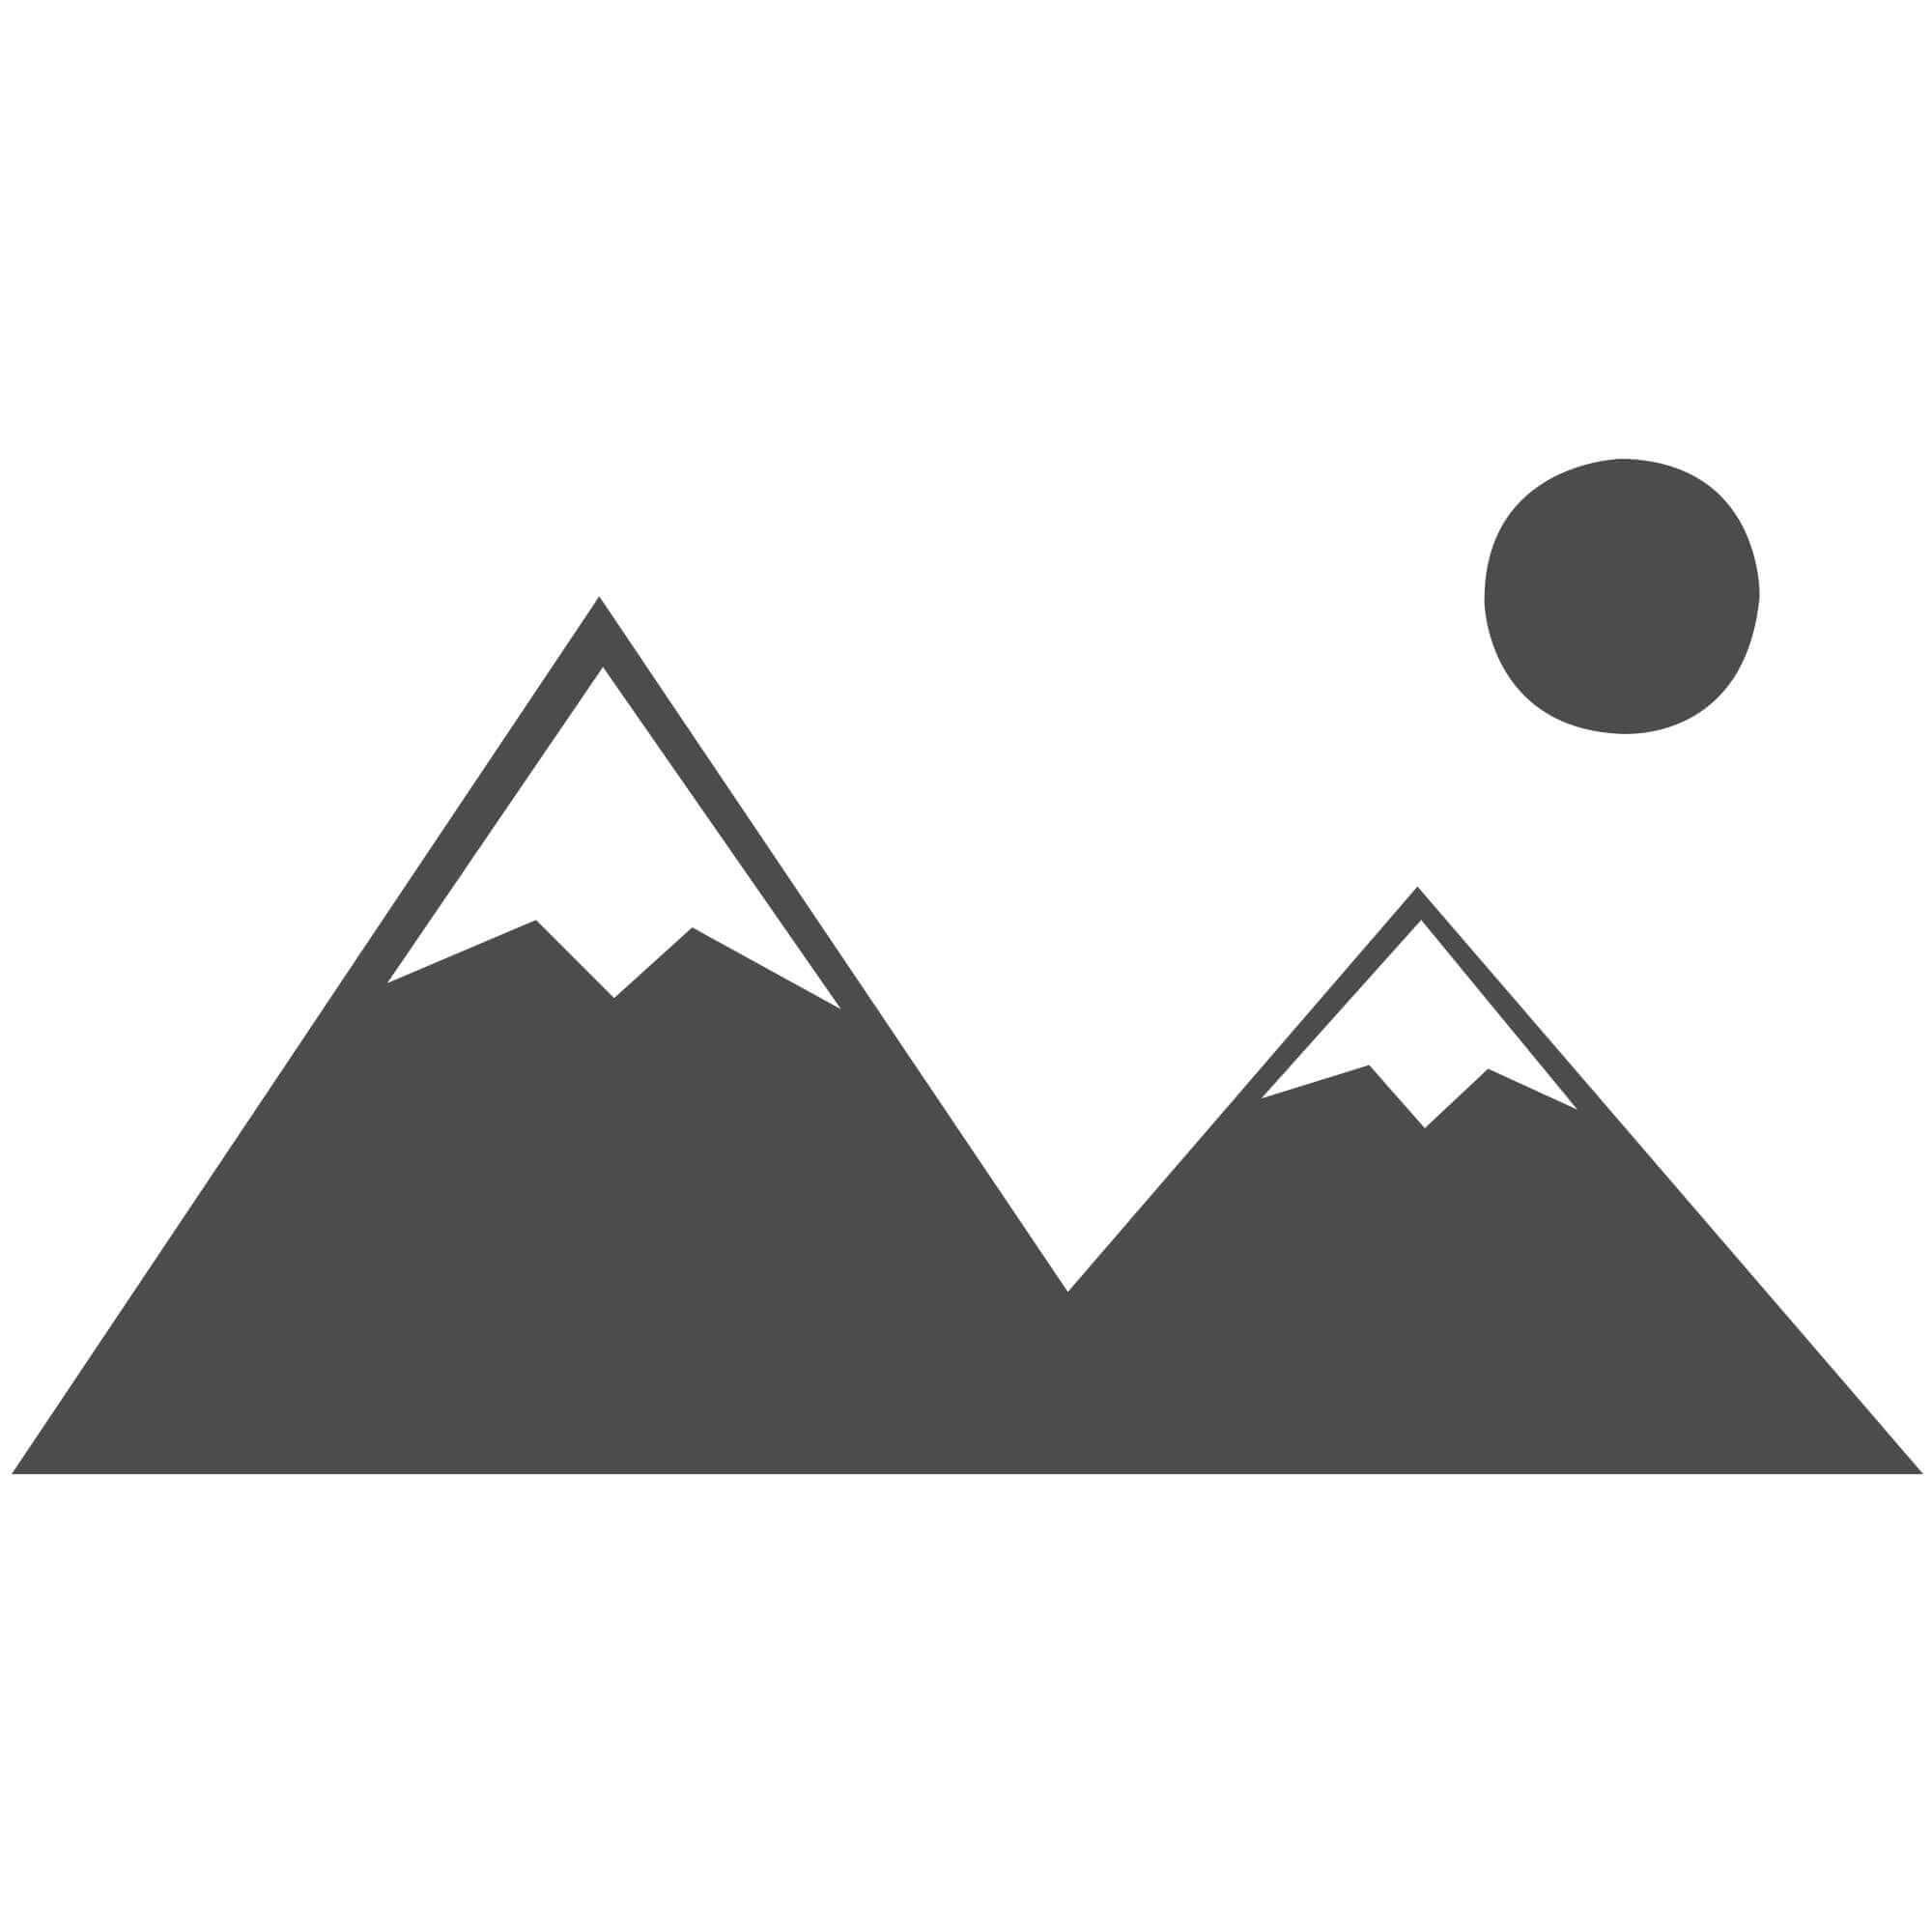 "Velvet Droplet Rug - Black Grey - Size 80 x 150 cm (2'8"" x 5')"